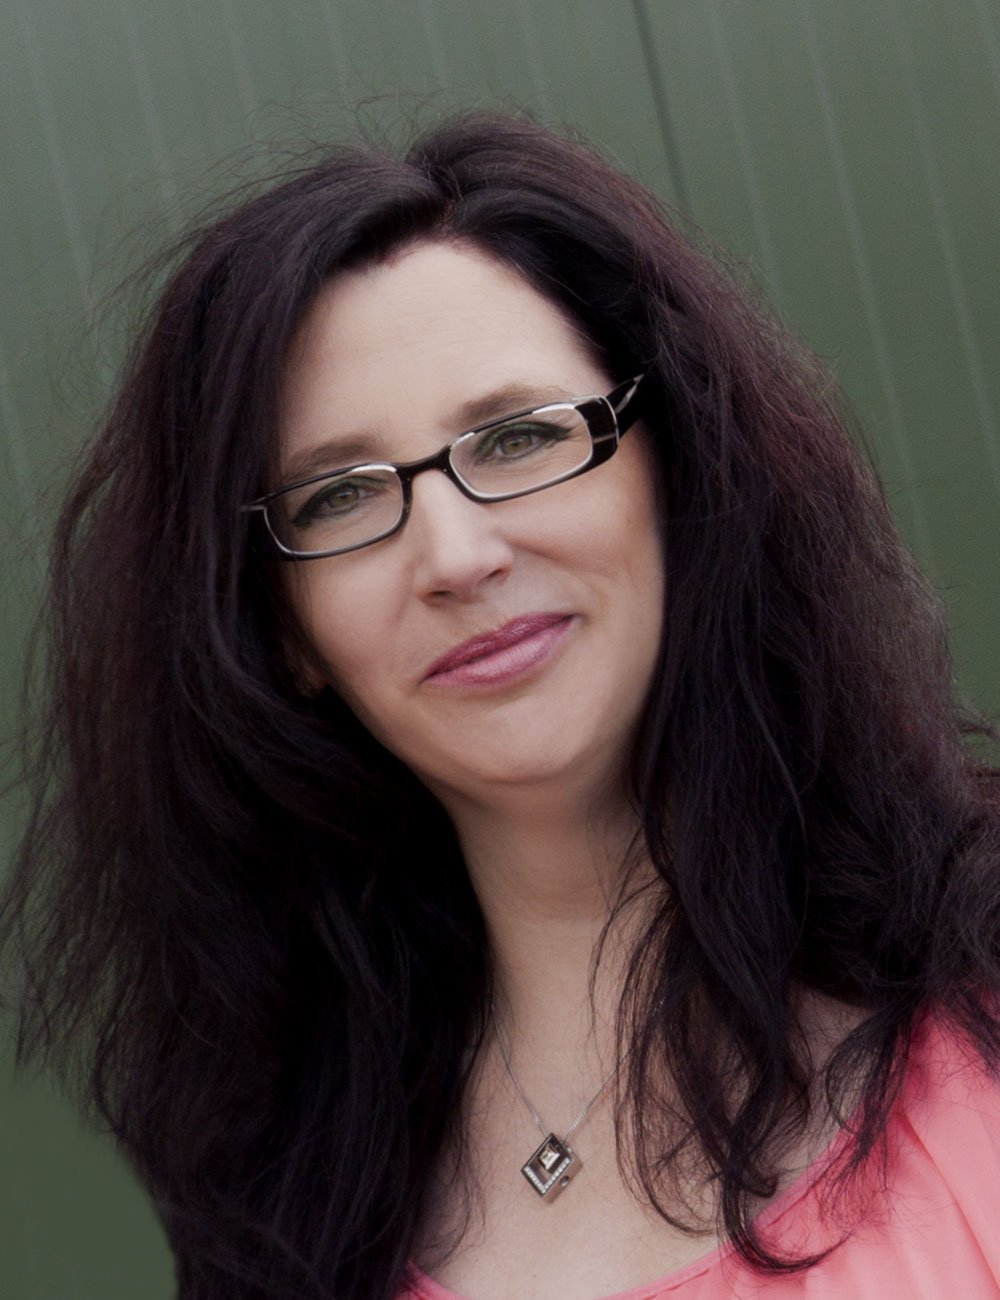 Angela Wißing